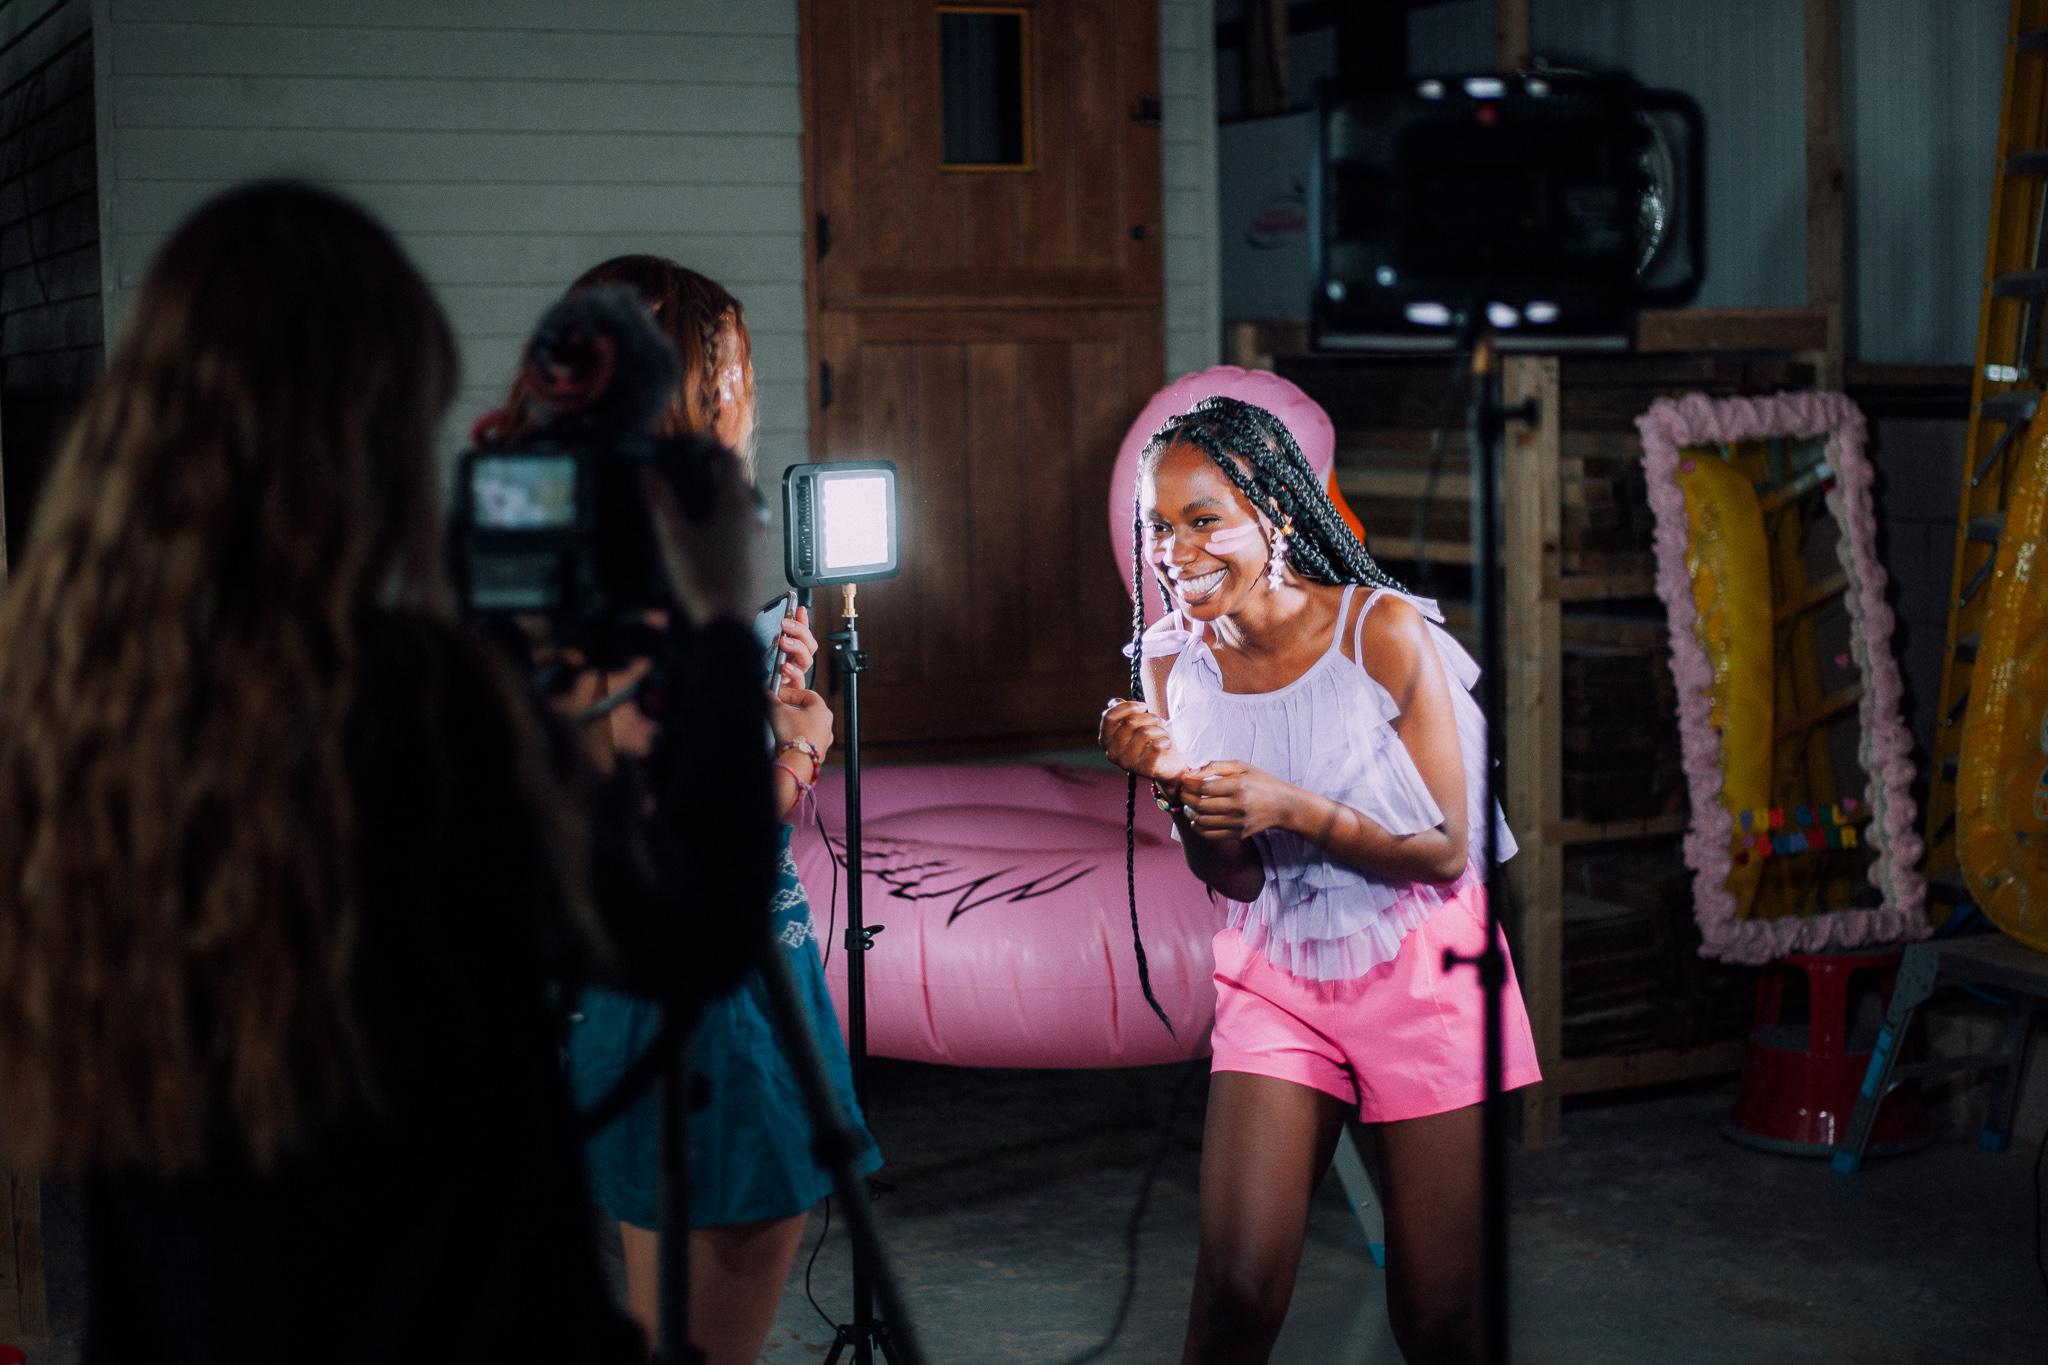 The Zena brand photo shoot, Stone Barrell